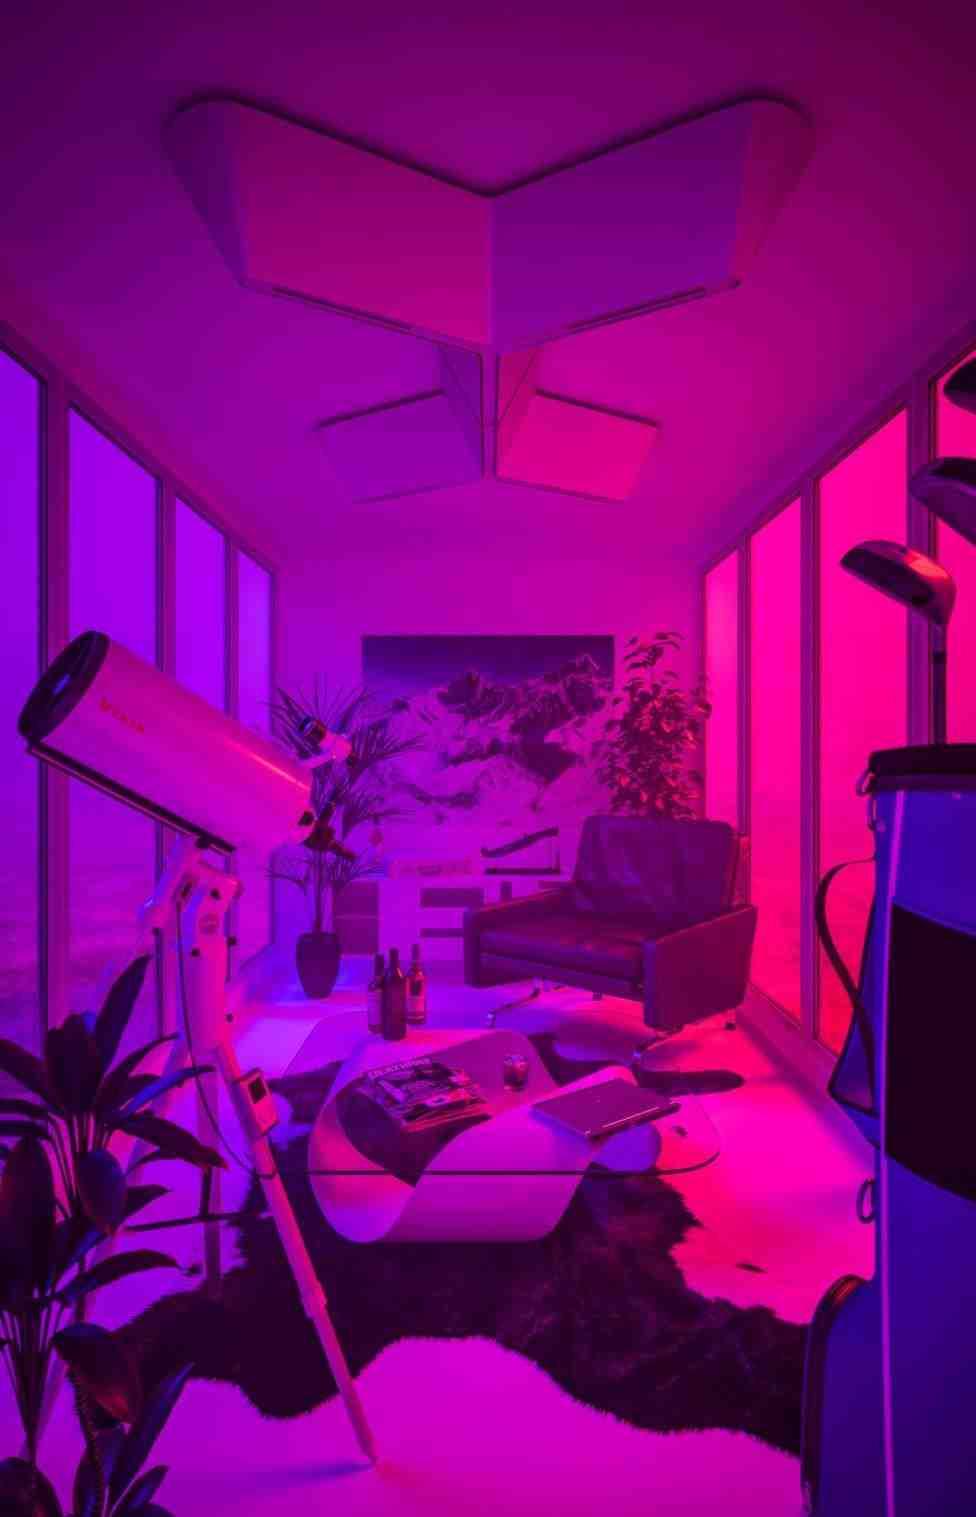 Purple Aesthetic Wallpapers Top Free Purple Aesthetic